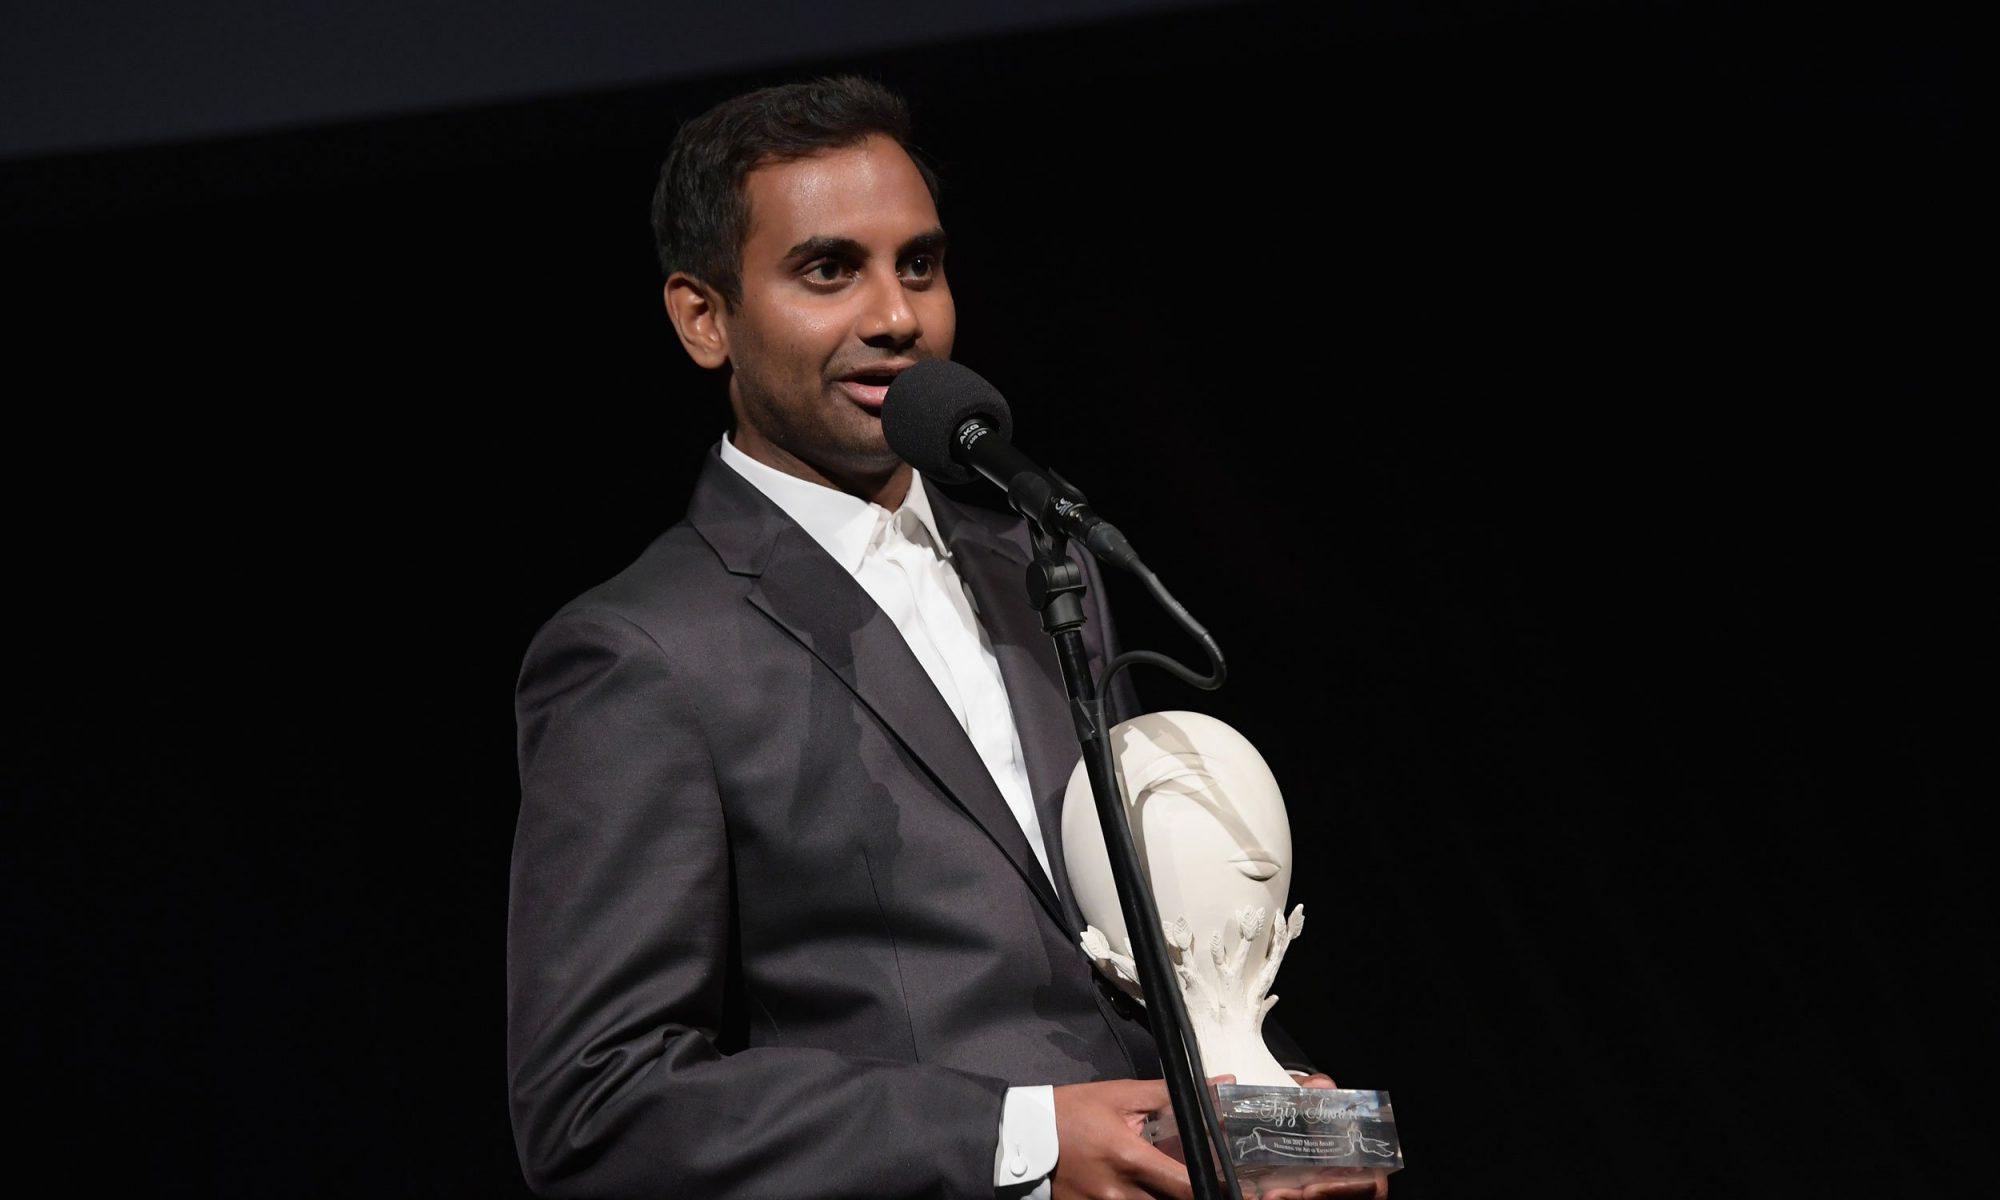 EC: How Aziz Ansari's Love of Bacon Inspired a 'Master of None' Episode